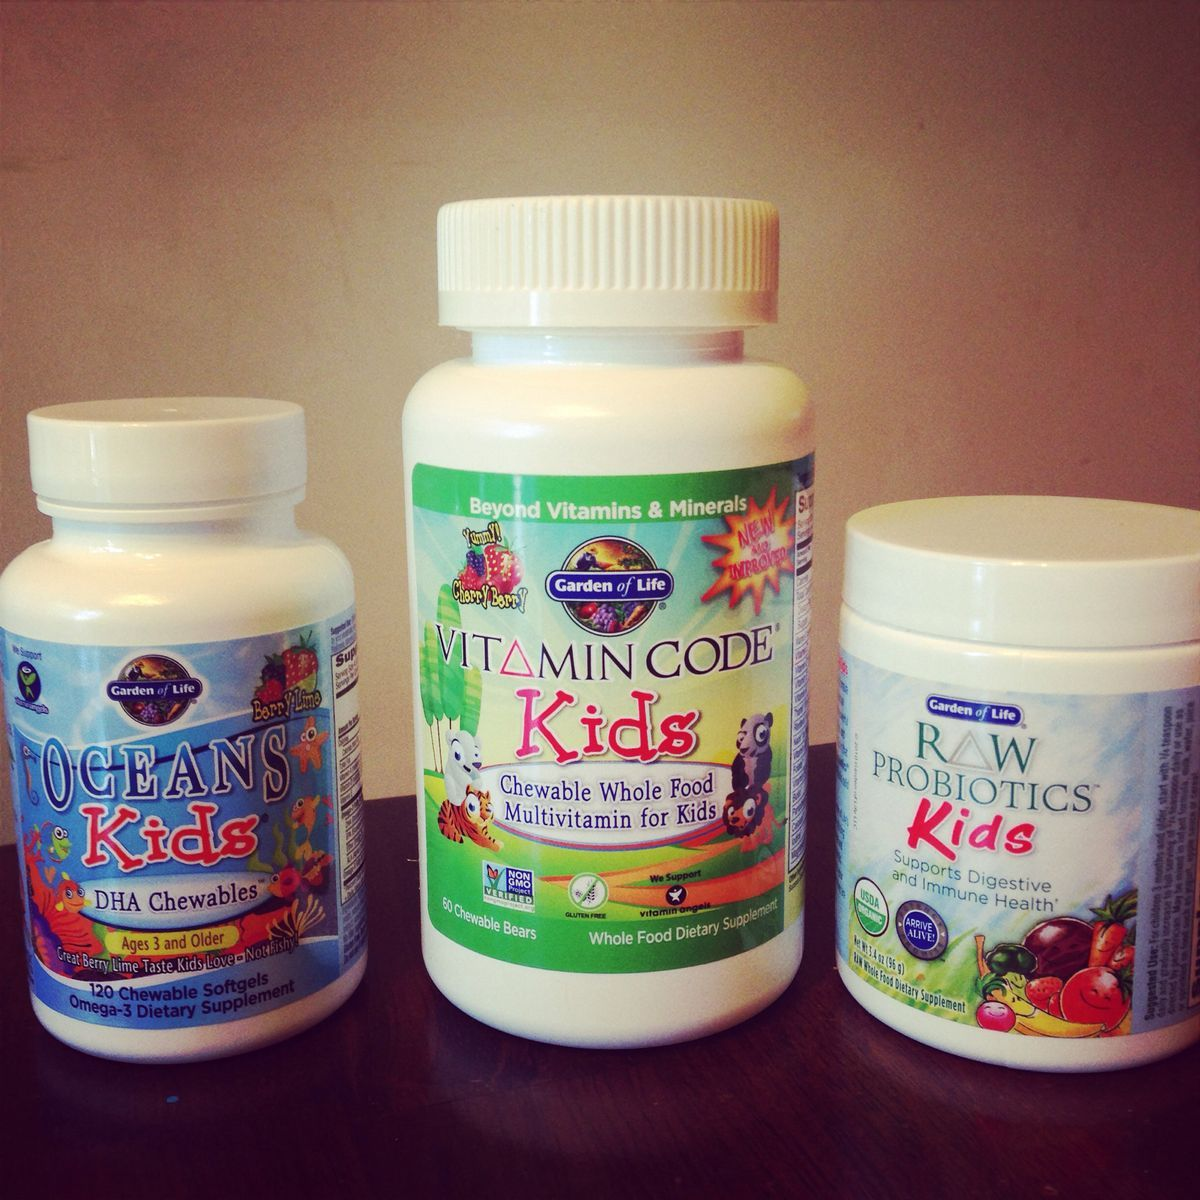 garden of life probiotics kids. We Love Garden Of Life Vitamins And Probiotics! This Is What I Give My 5 Probiotics Kids